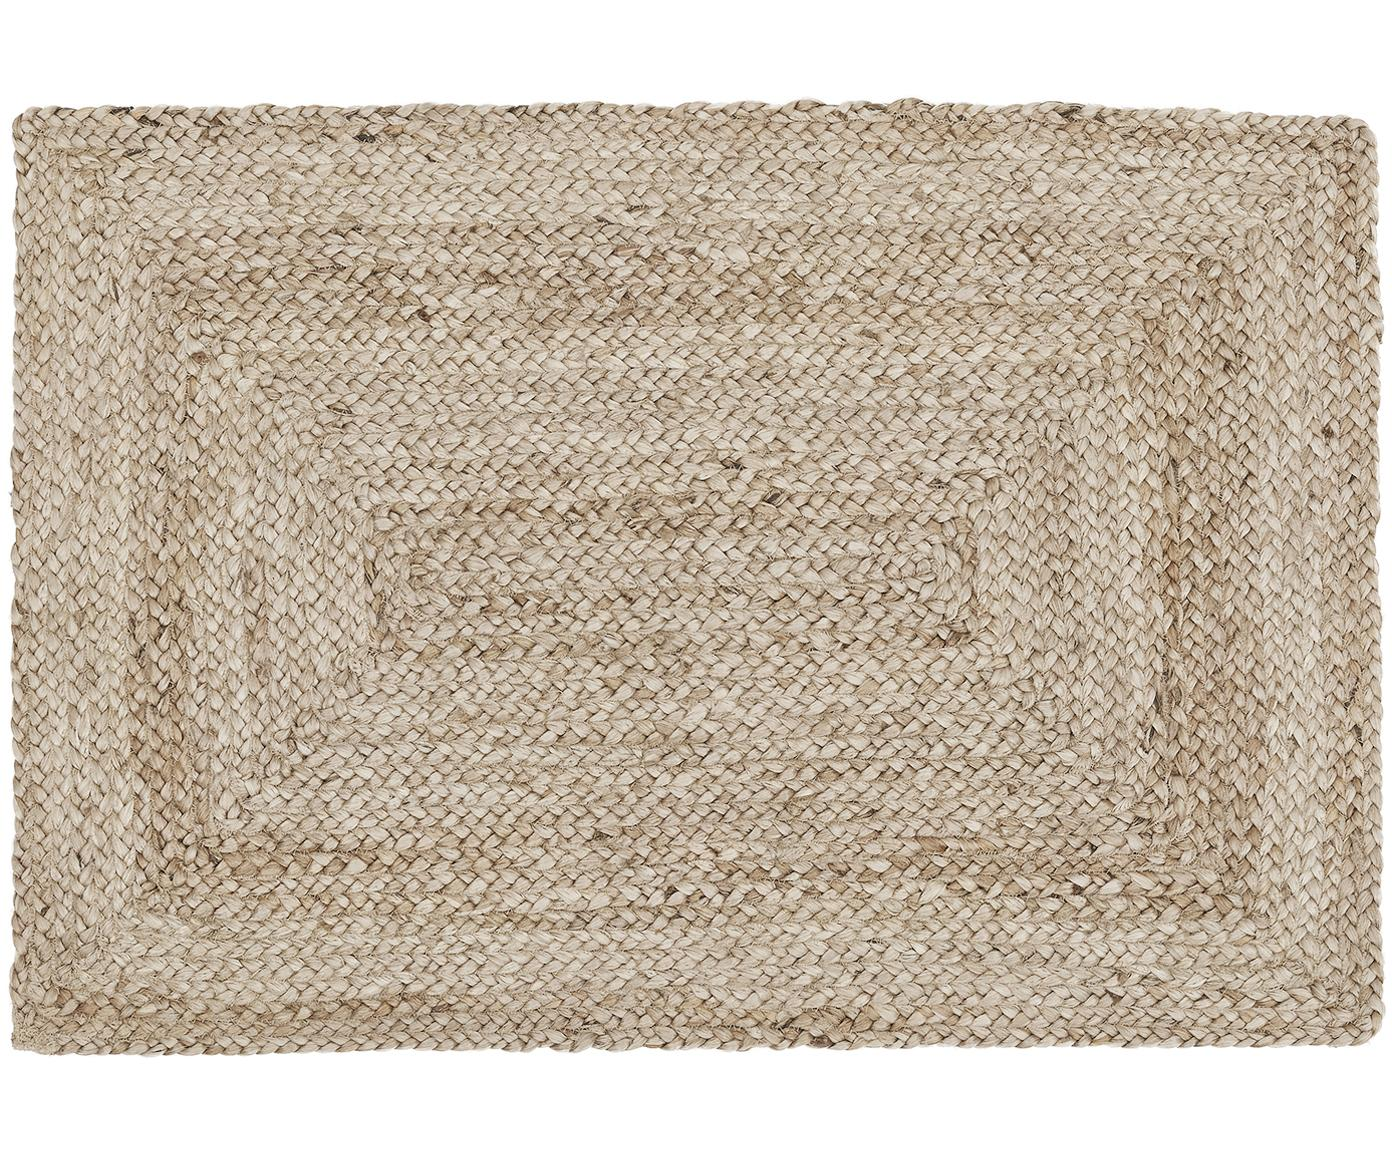 Alfombra artesanal de yute Sharmila, Beige, An 60 x L 90 cm (Tamaño XXS)